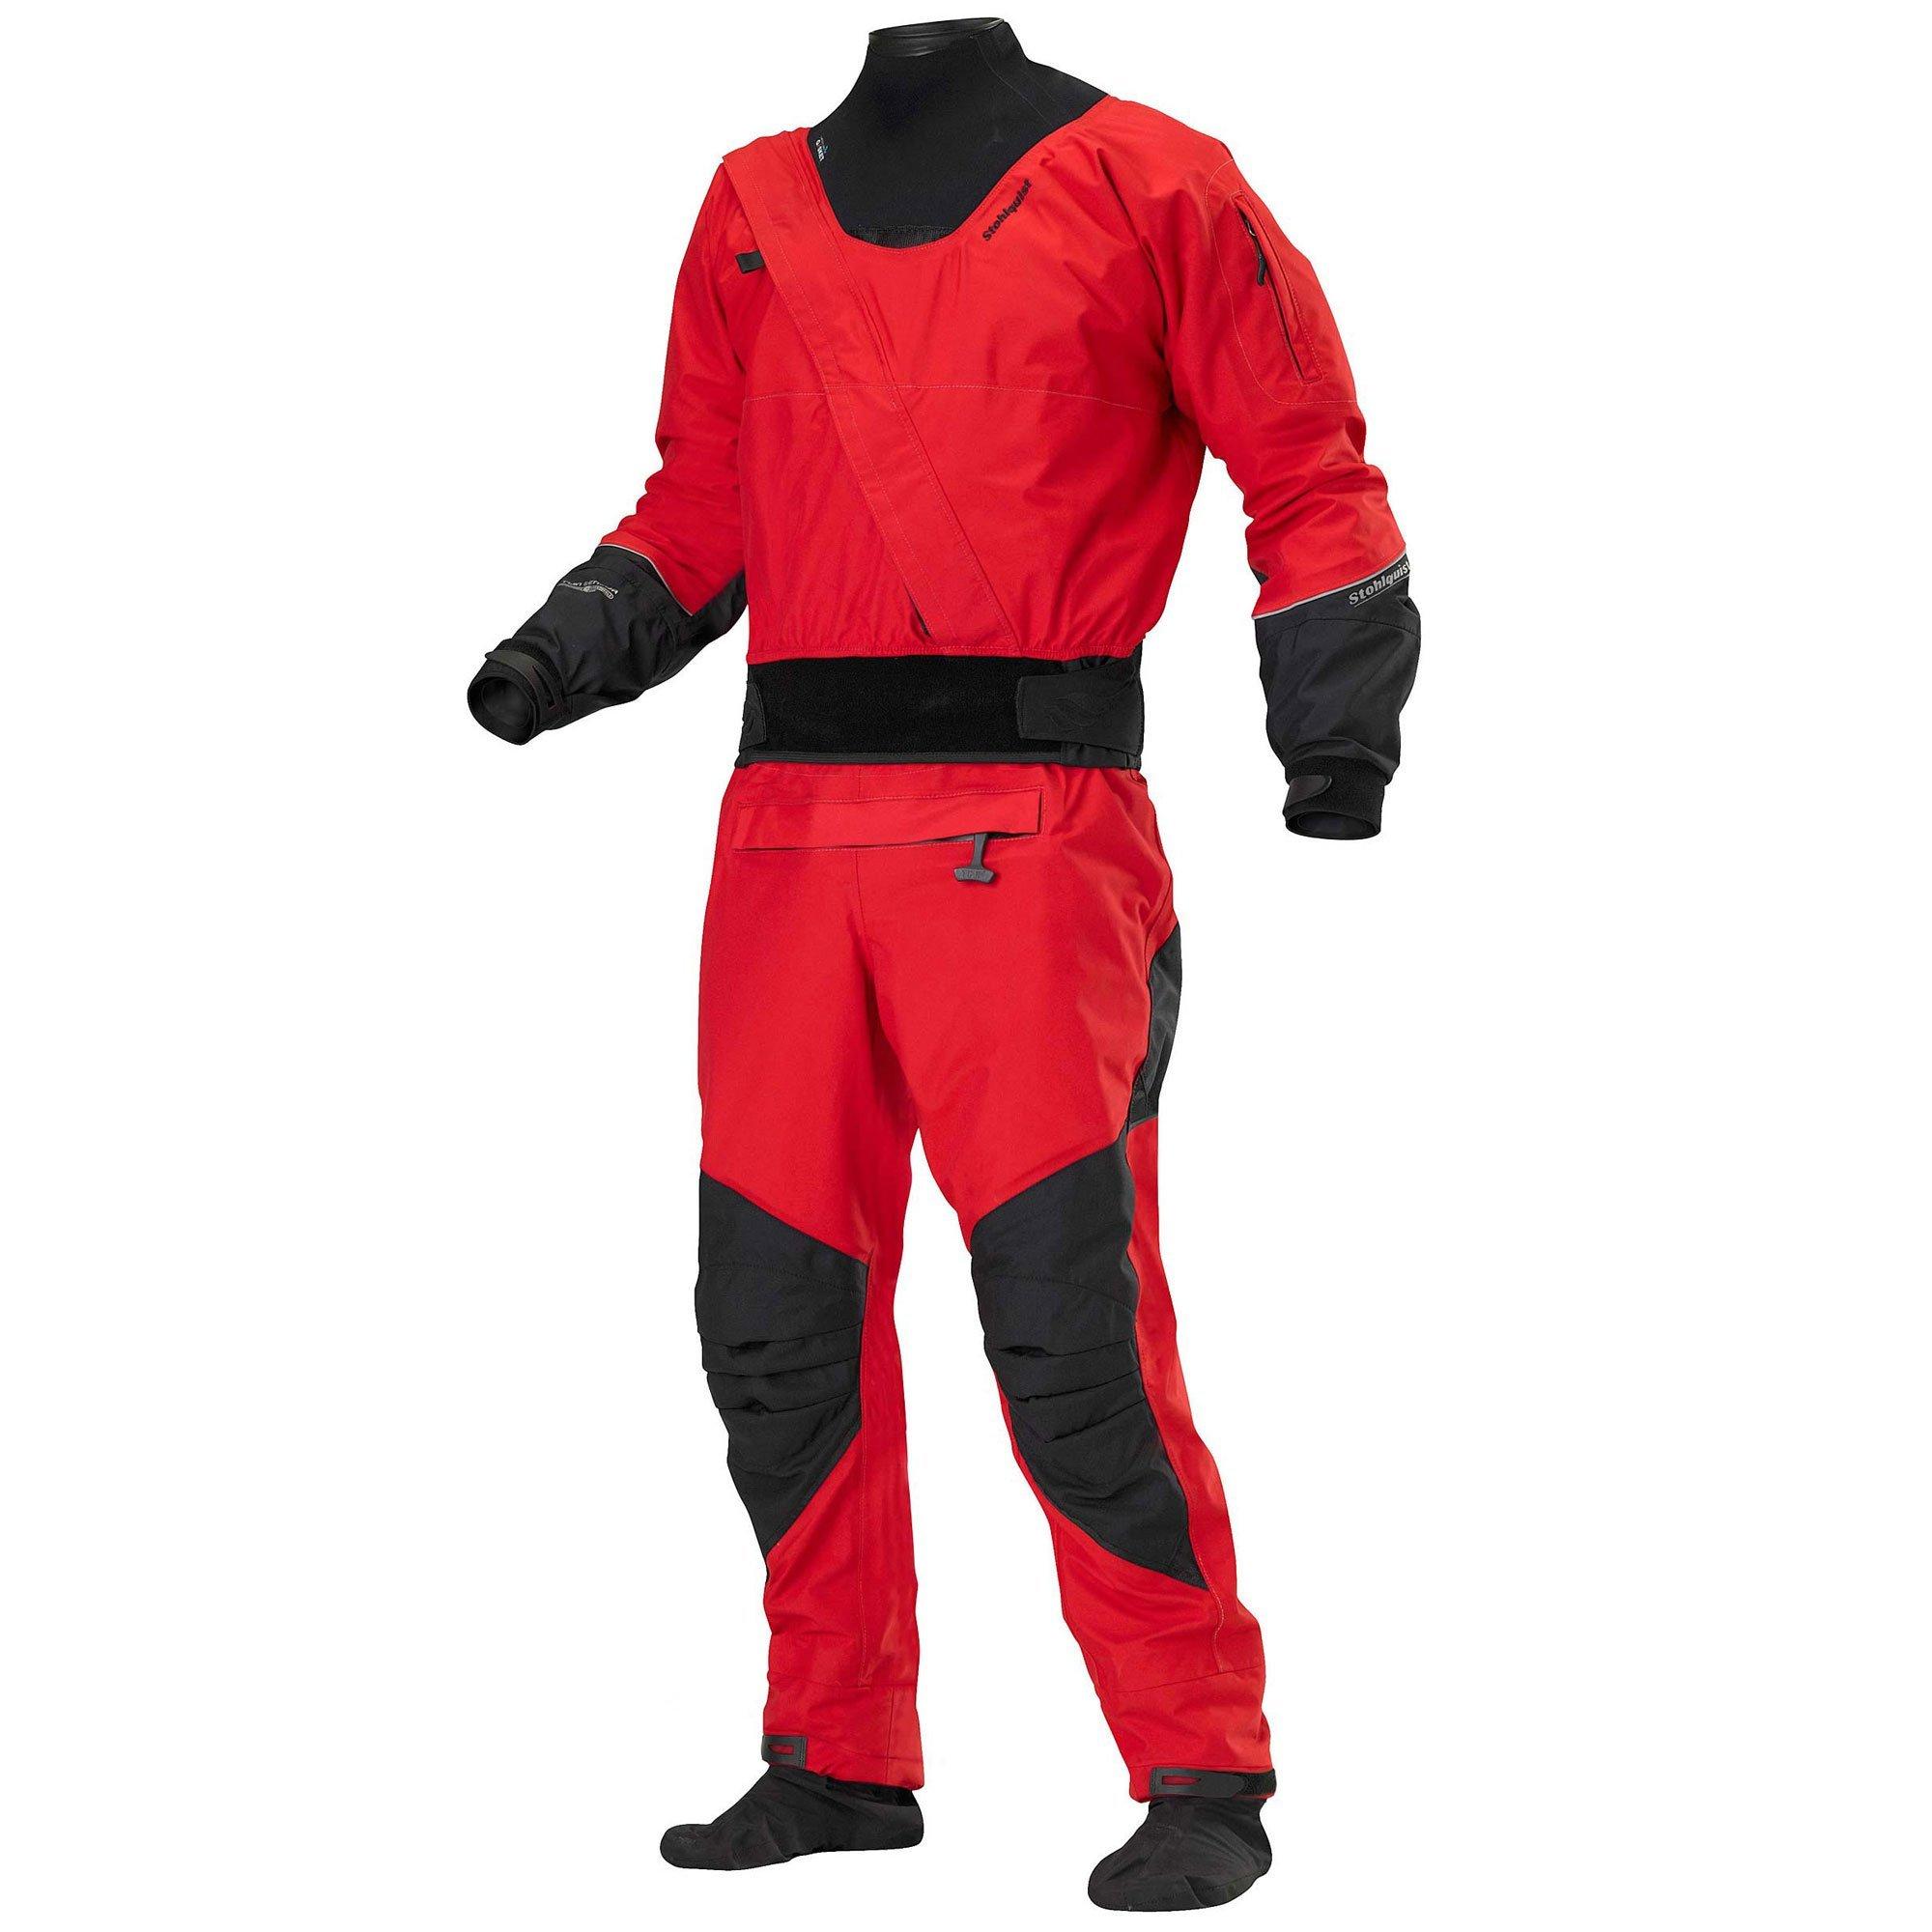 Stohlquist Amp Drysuit with Tunnel Drysuit (Fireball Red/Black, Medium)